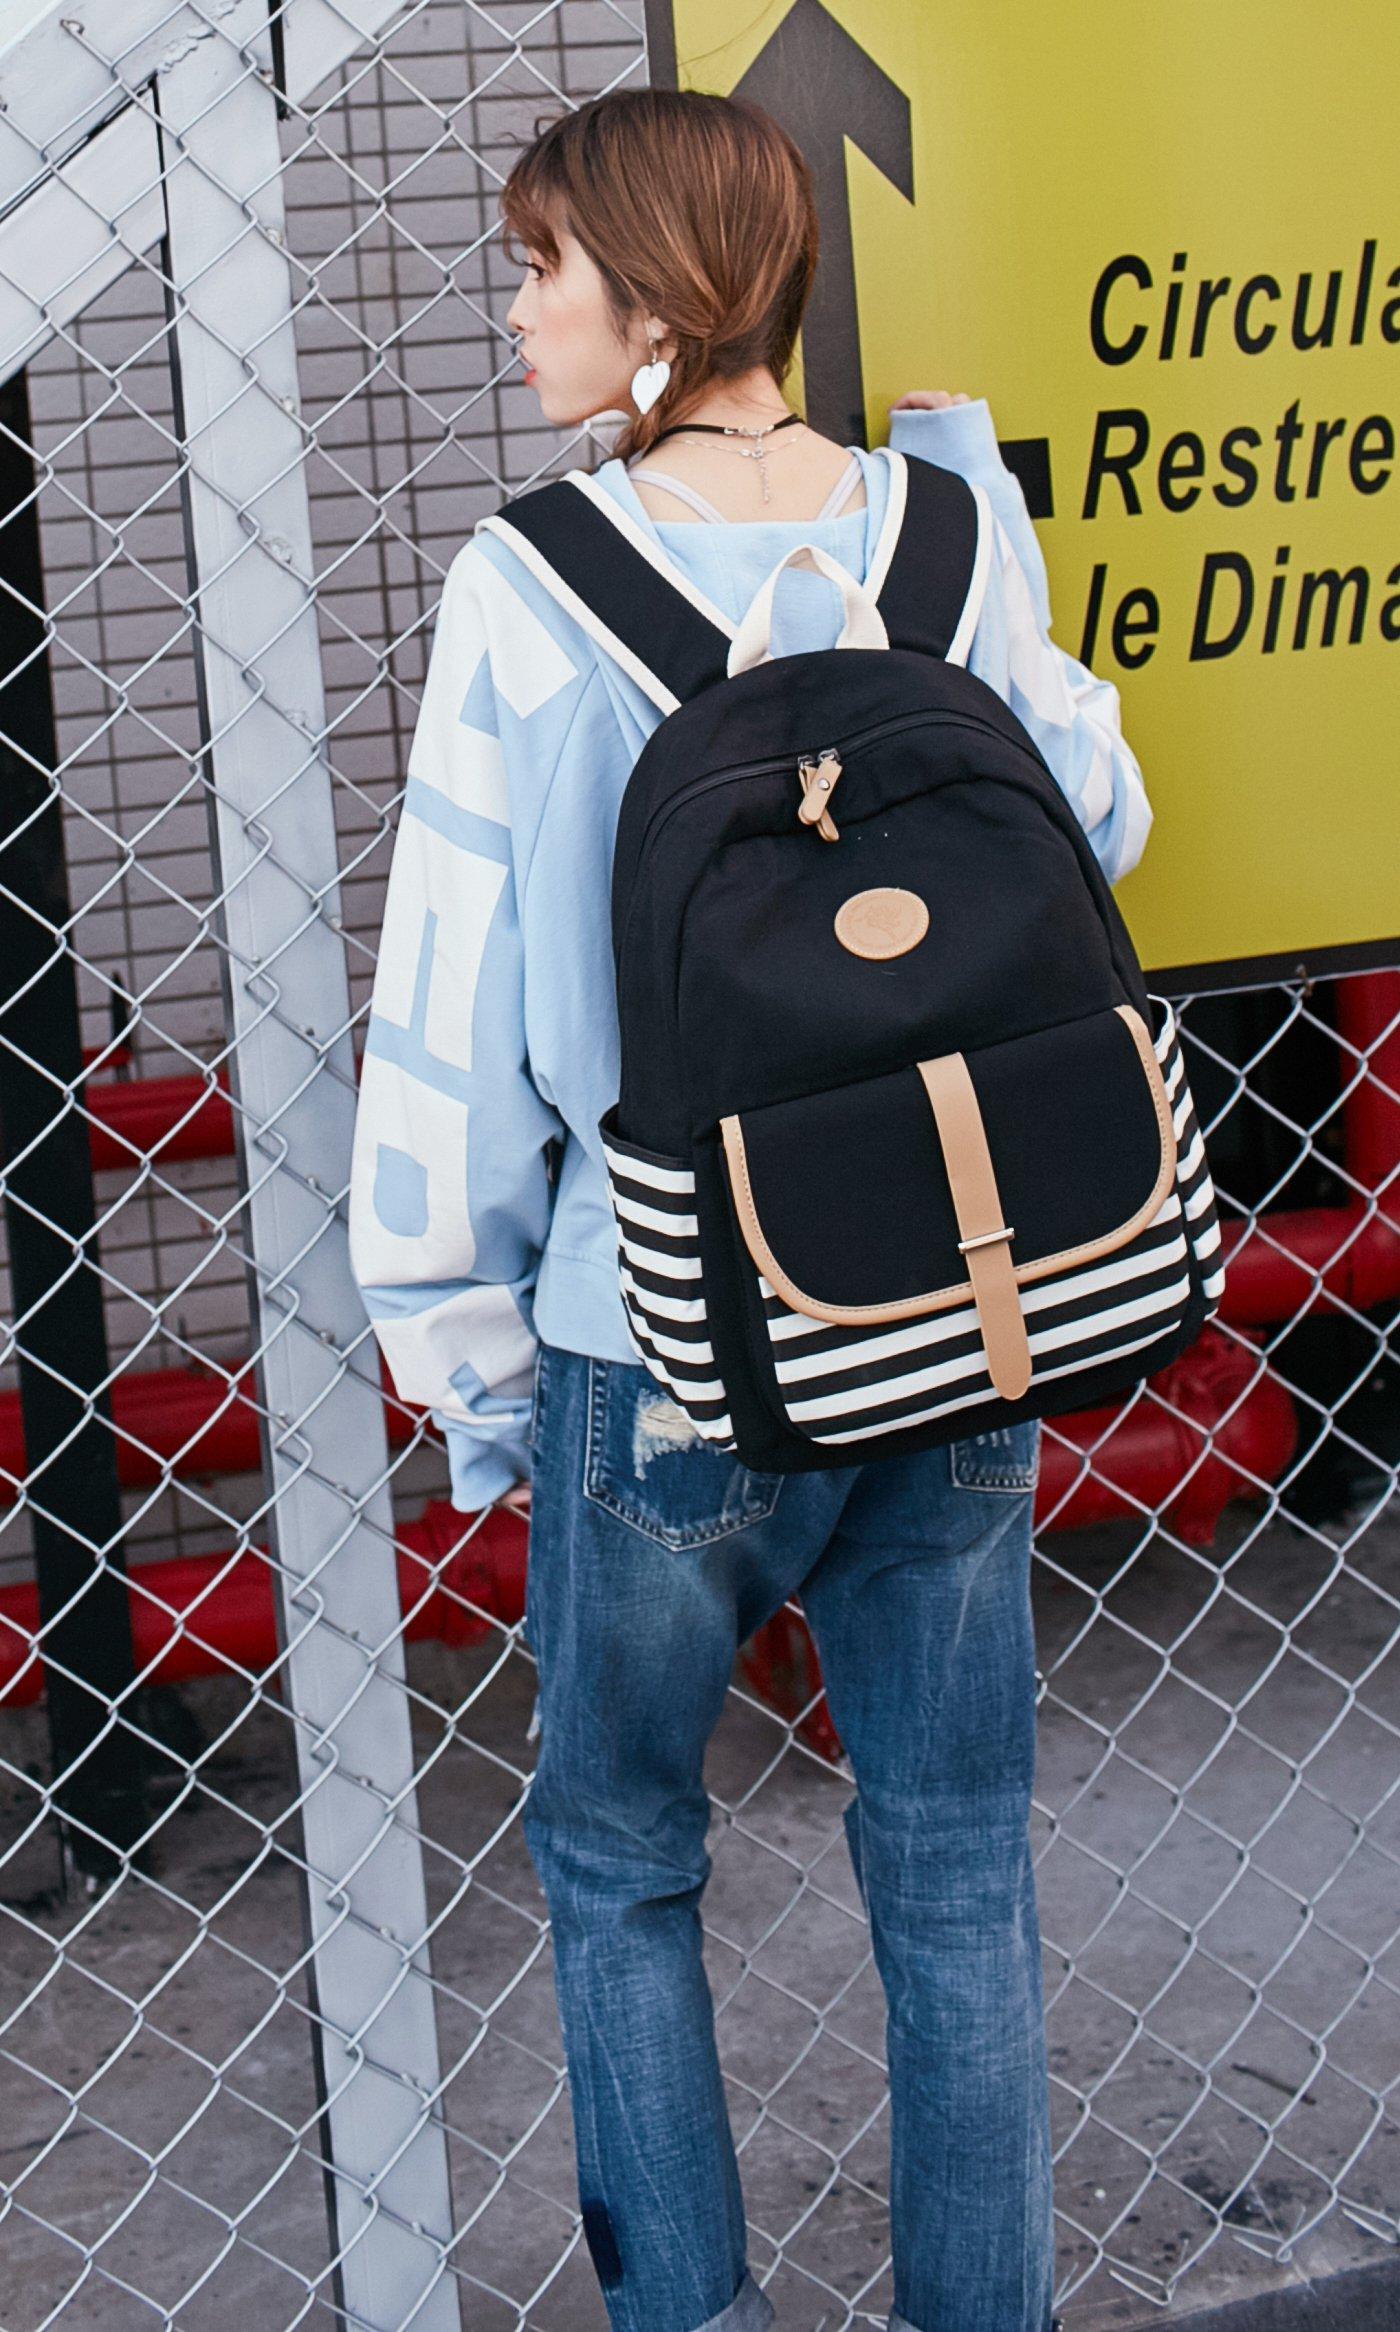 School Backpack for Girls, Gazigo Womens High School College Bookbags Laptop Bag (Black) by Gazigo (Image #10)